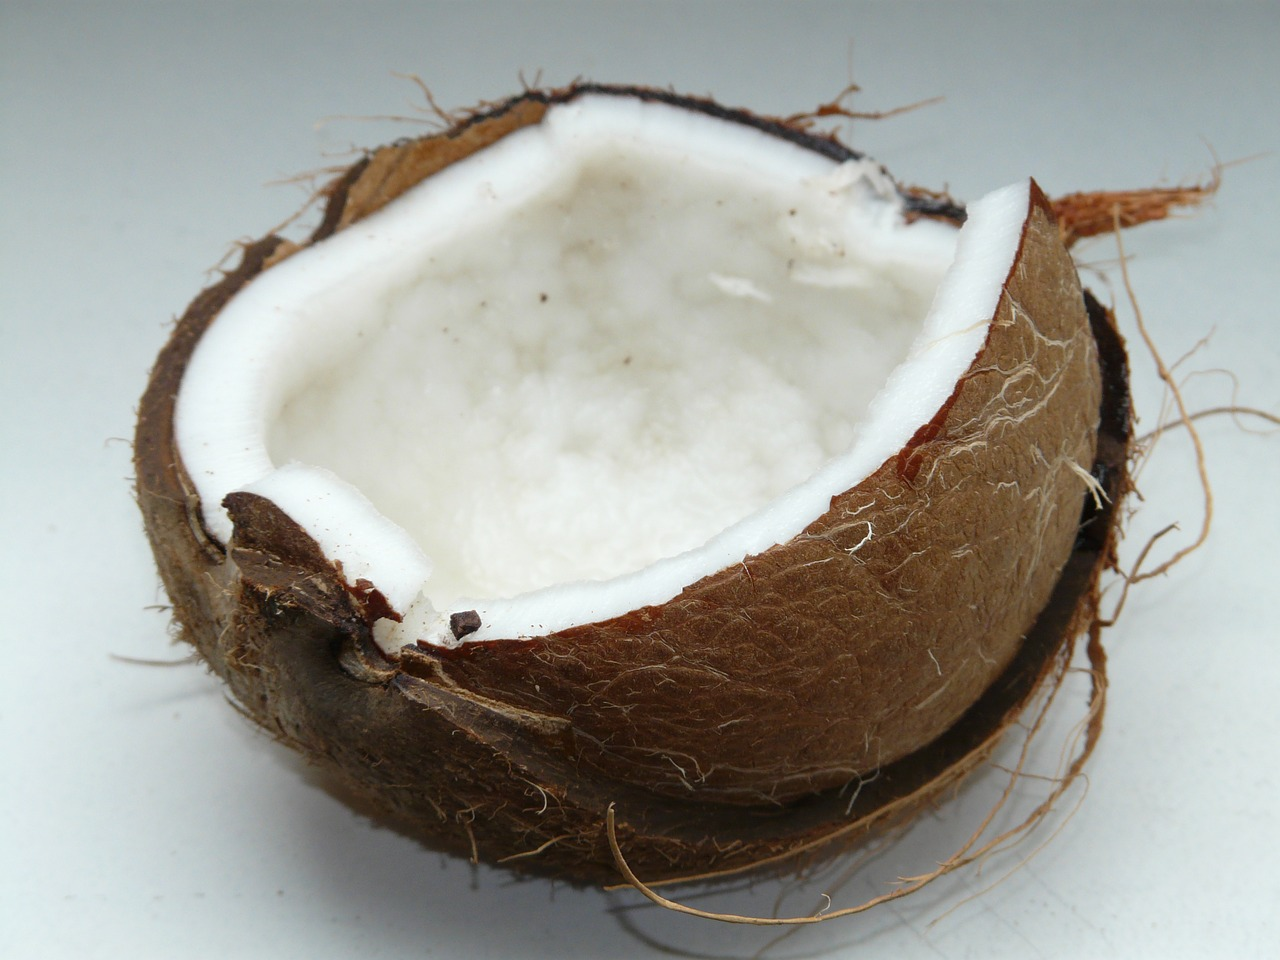 coconut-60395_1280